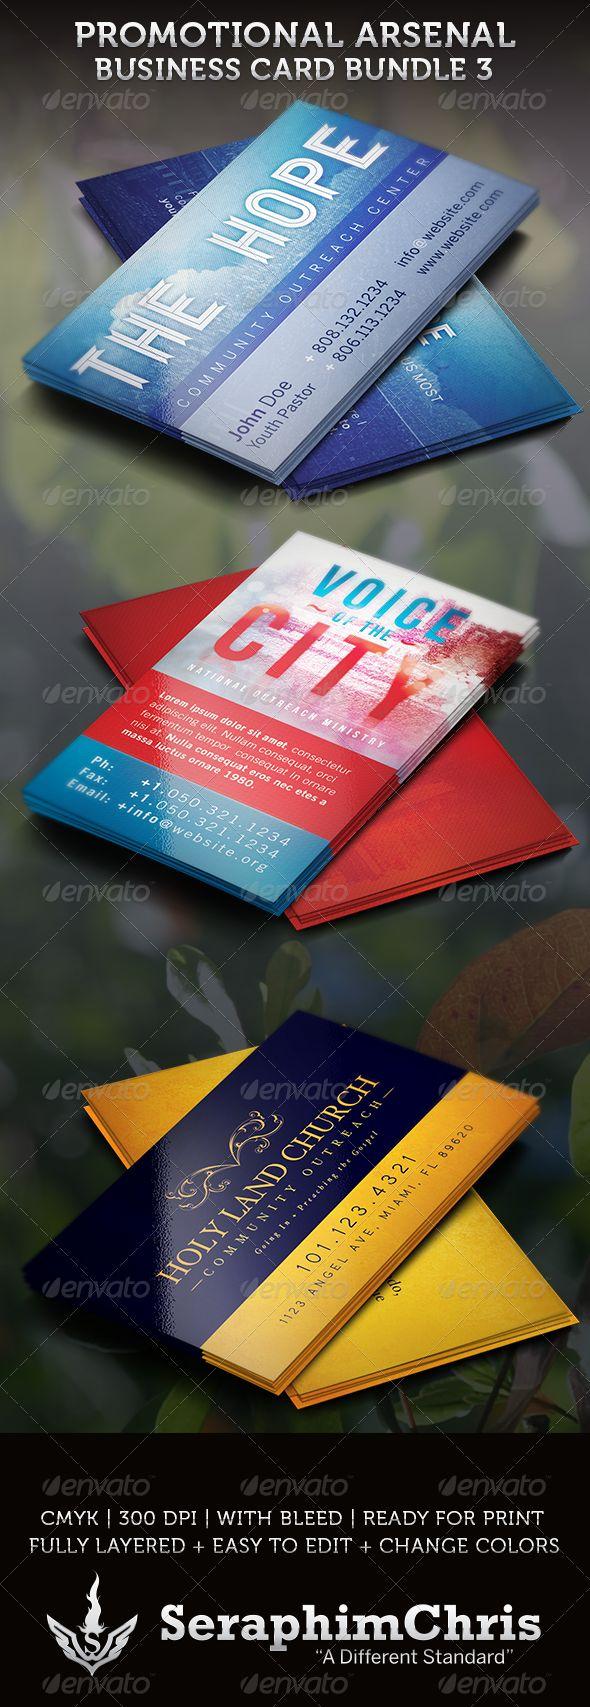 40 best political branding images on pinterest architecture promotional arsenal business card bundle 3 magicingreecefo Images